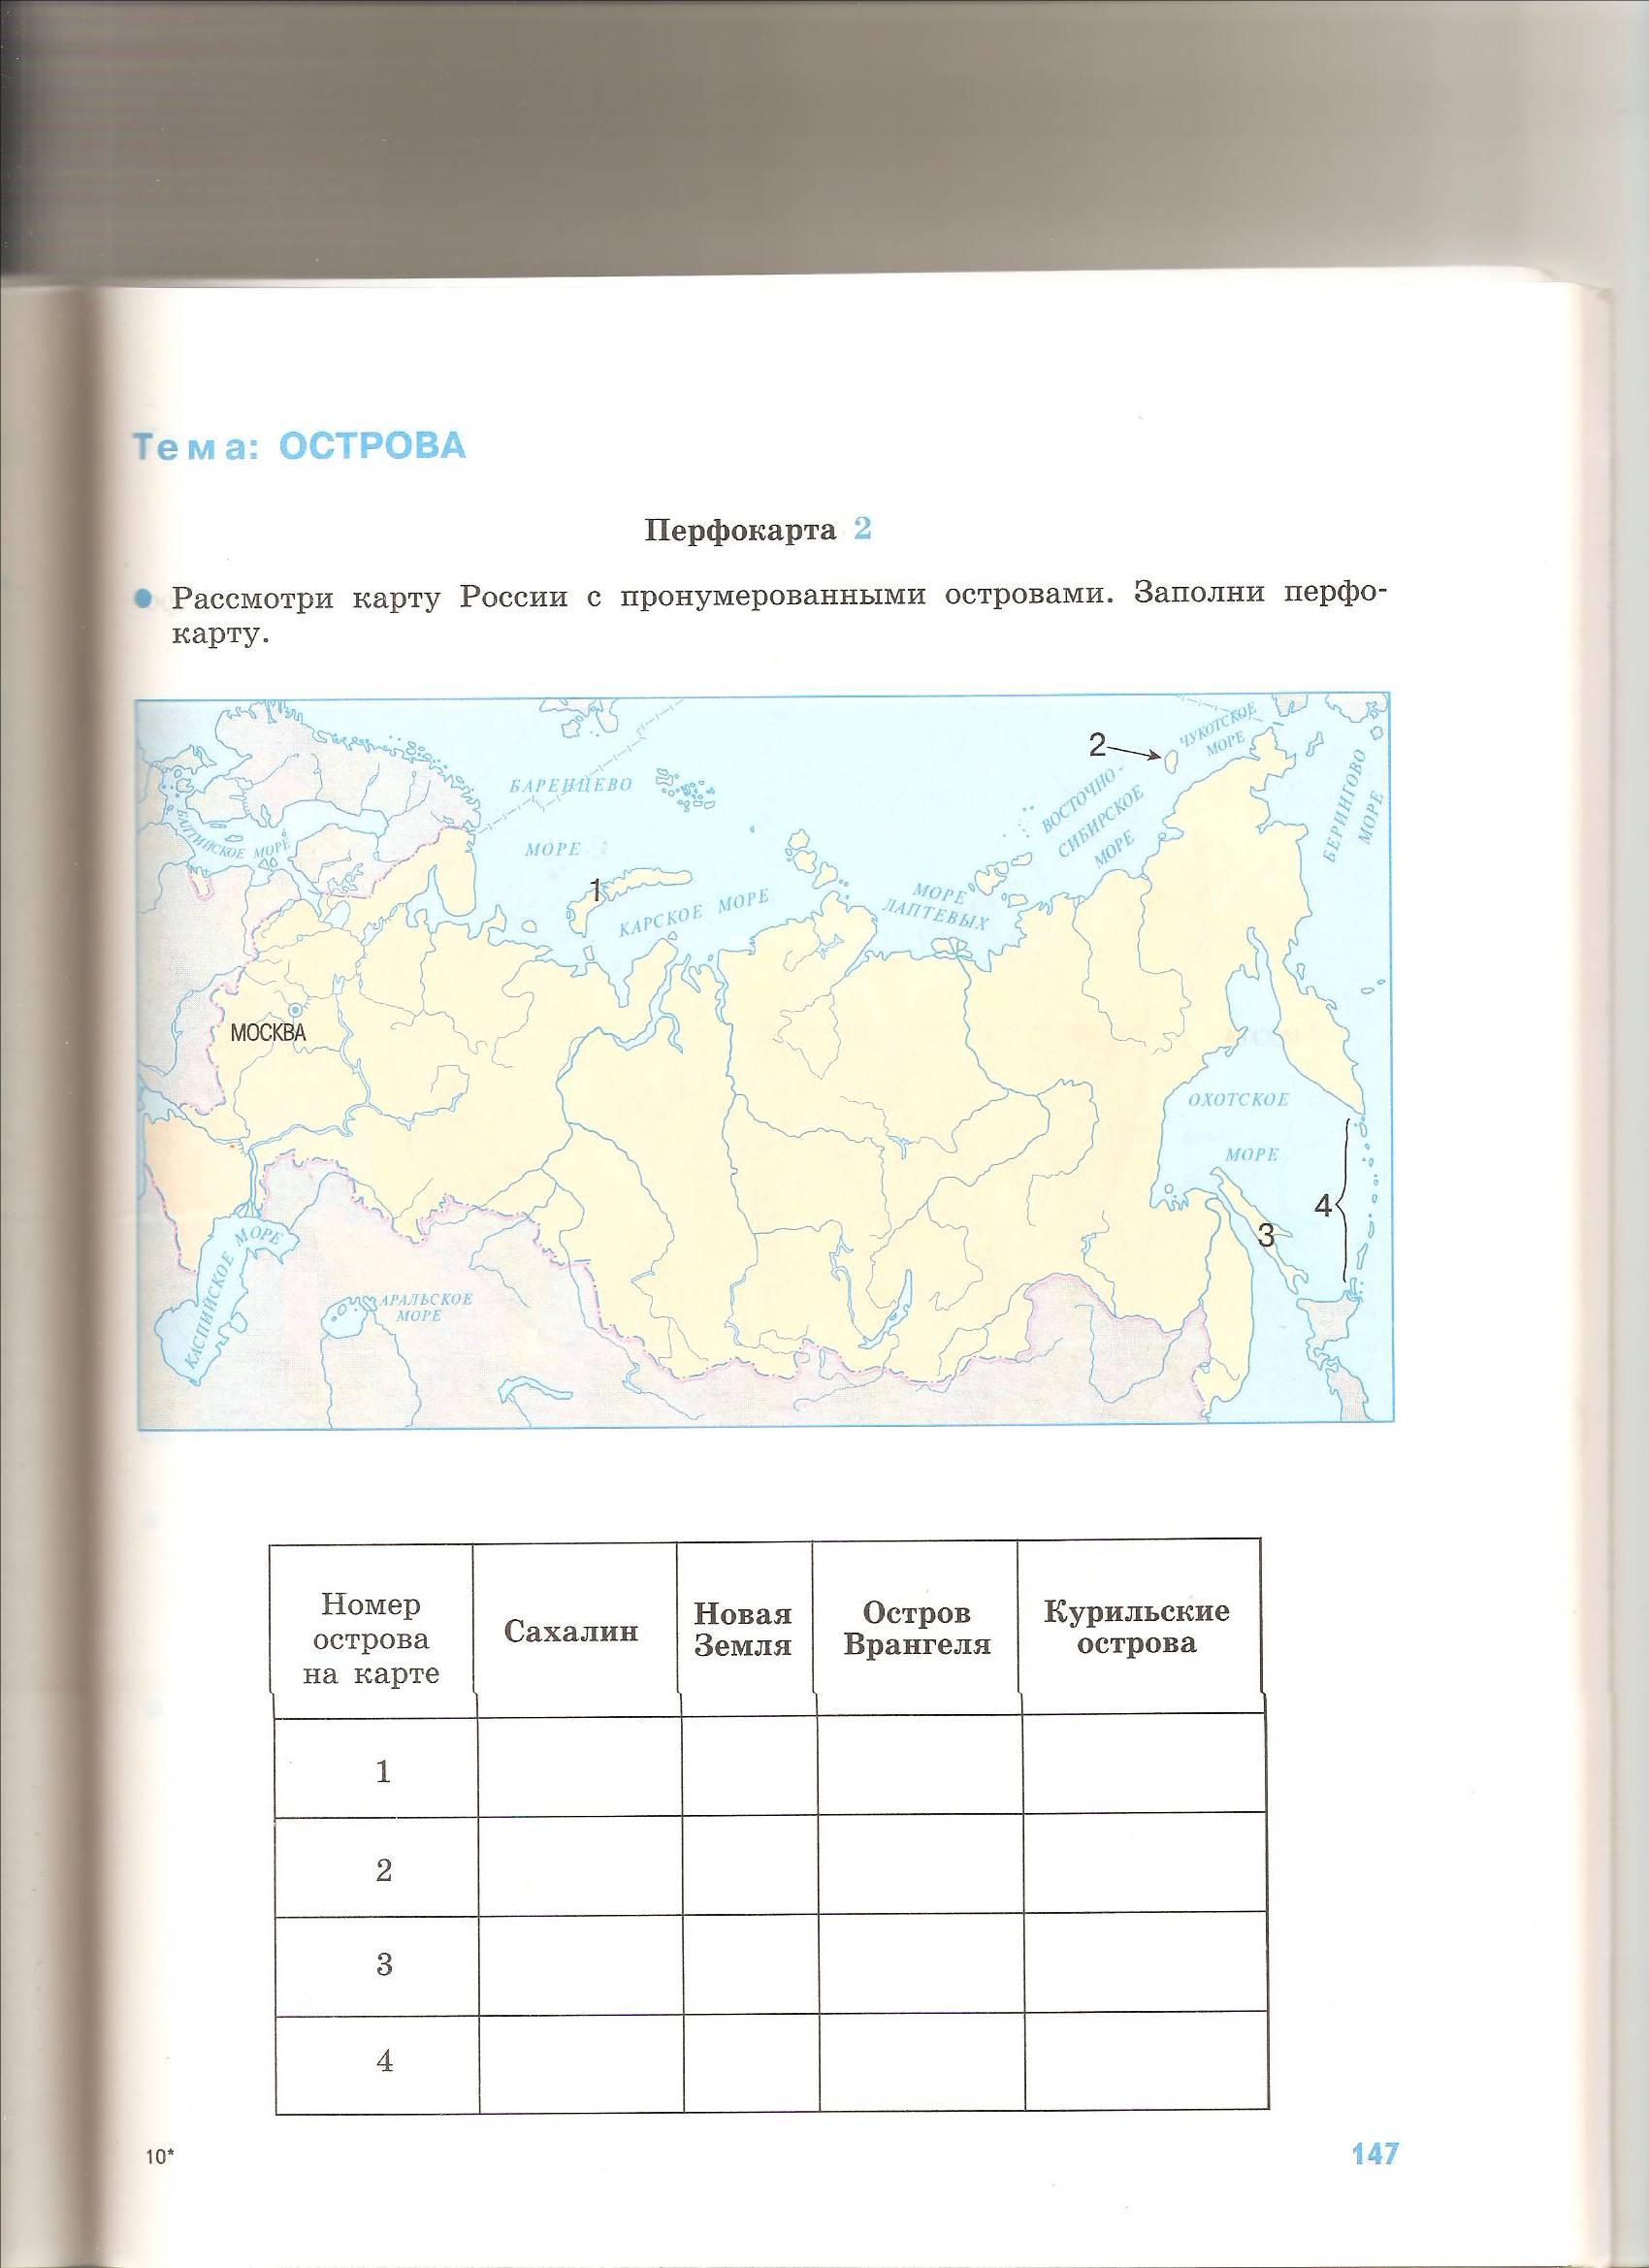 C:\Documents and Settings\Наталья\Рабочий стол\Изображение 001.jpg